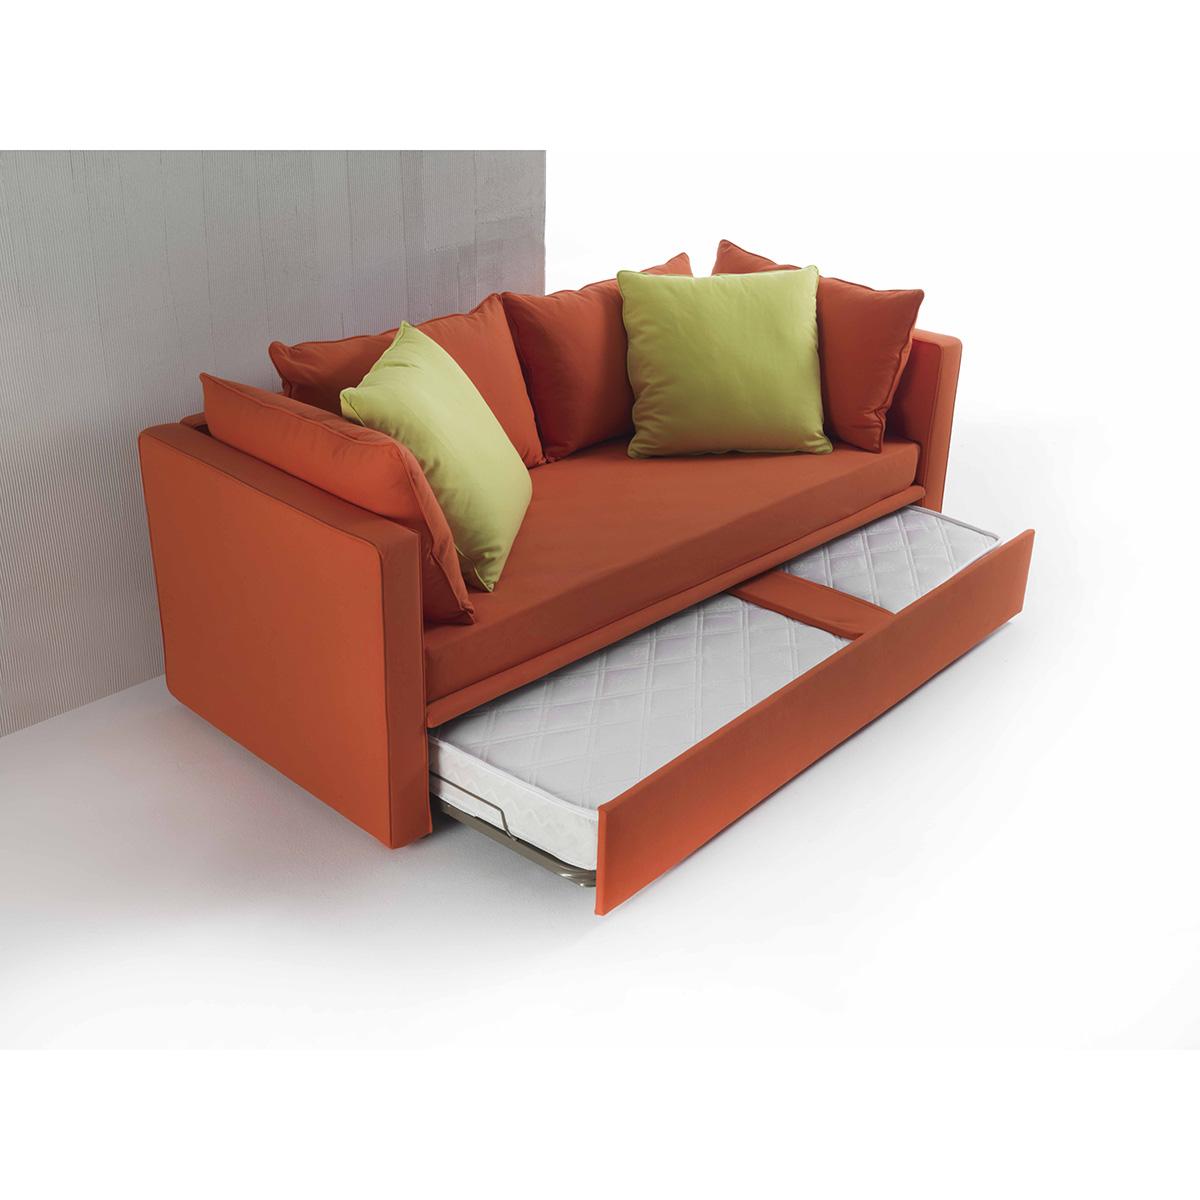 canap lit gigogne quimper meubles et atmosph re. Black Bedroom Furniture Sets. Home Design Ideas